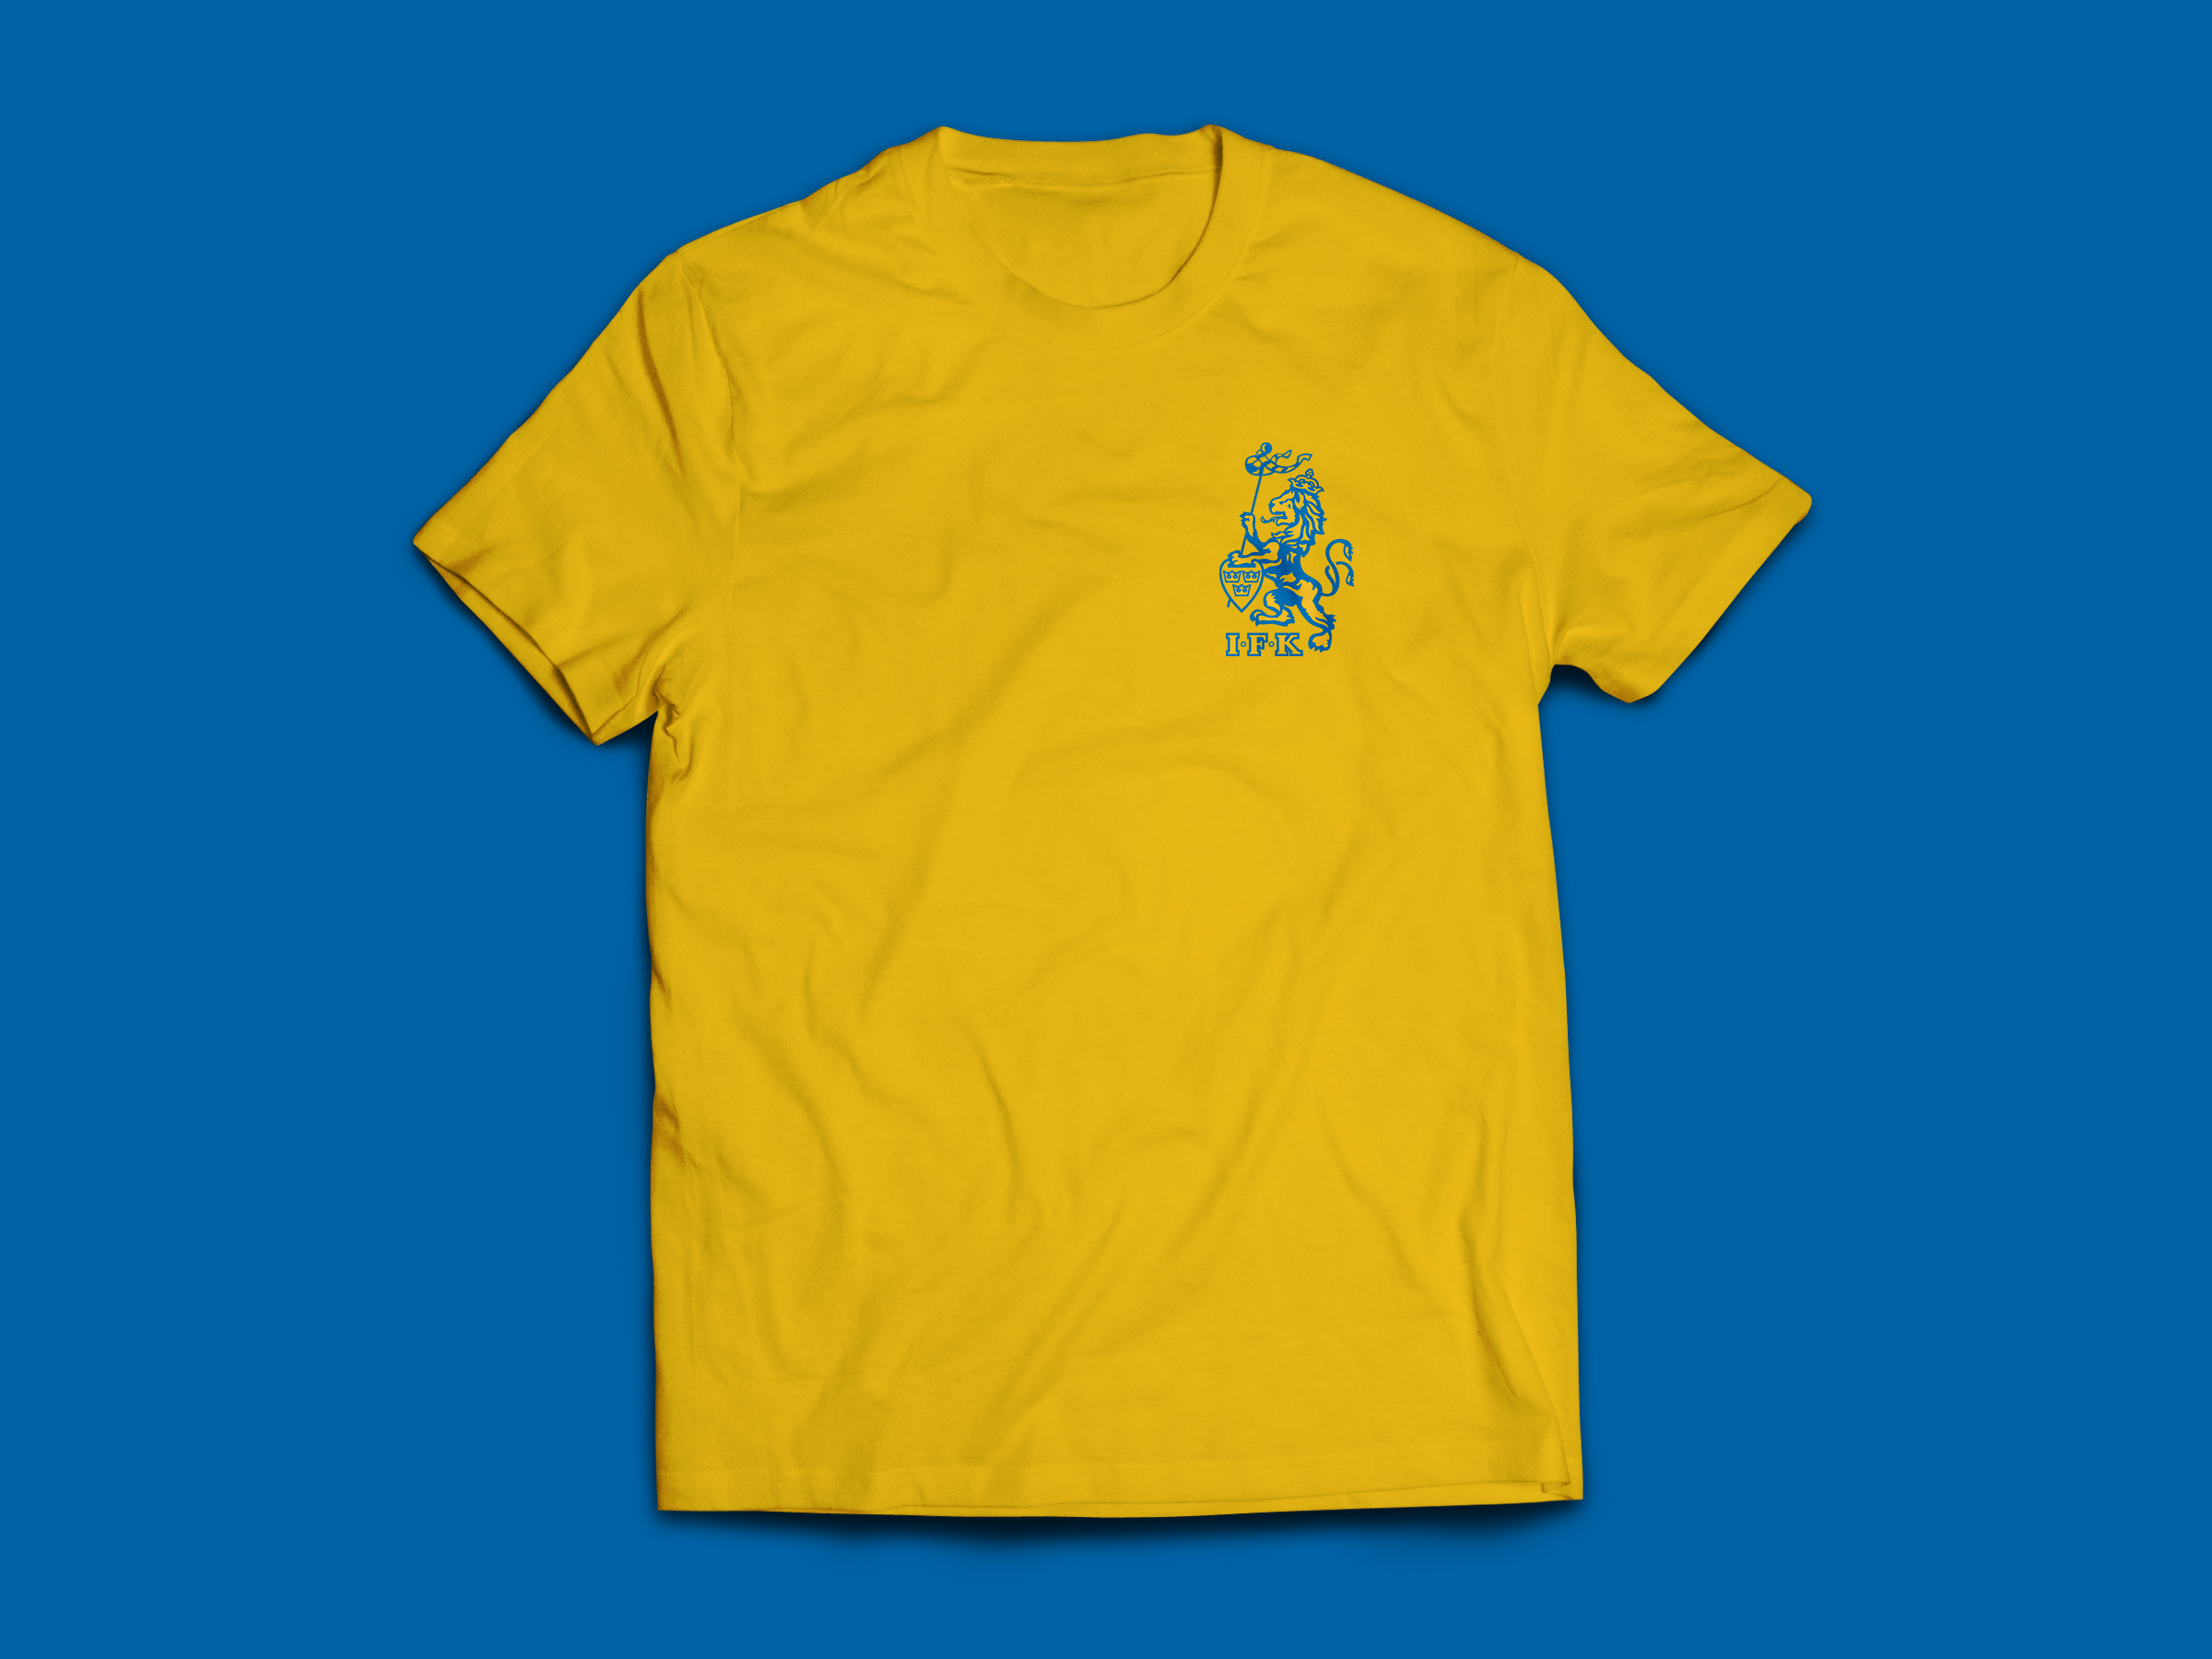 IFK Göteborg Shirt Design 1 small logo.png